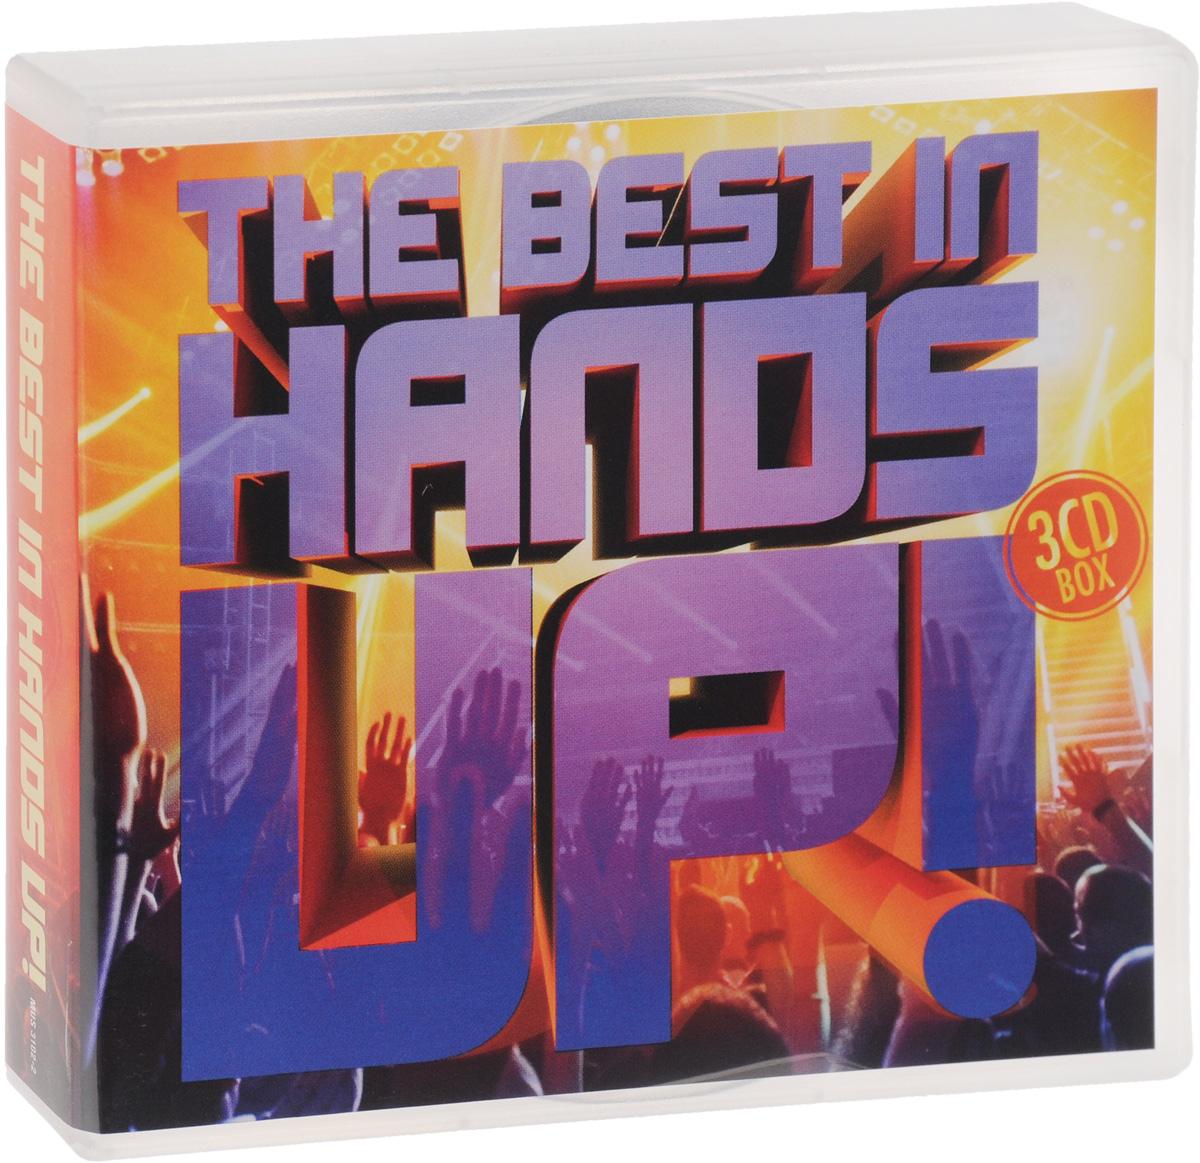 Best In Hands Up! (3 CD) михаил плетнев филип лейджер роджер норрингтон джон нельсон сабин мейер best adagios 50 3 cd